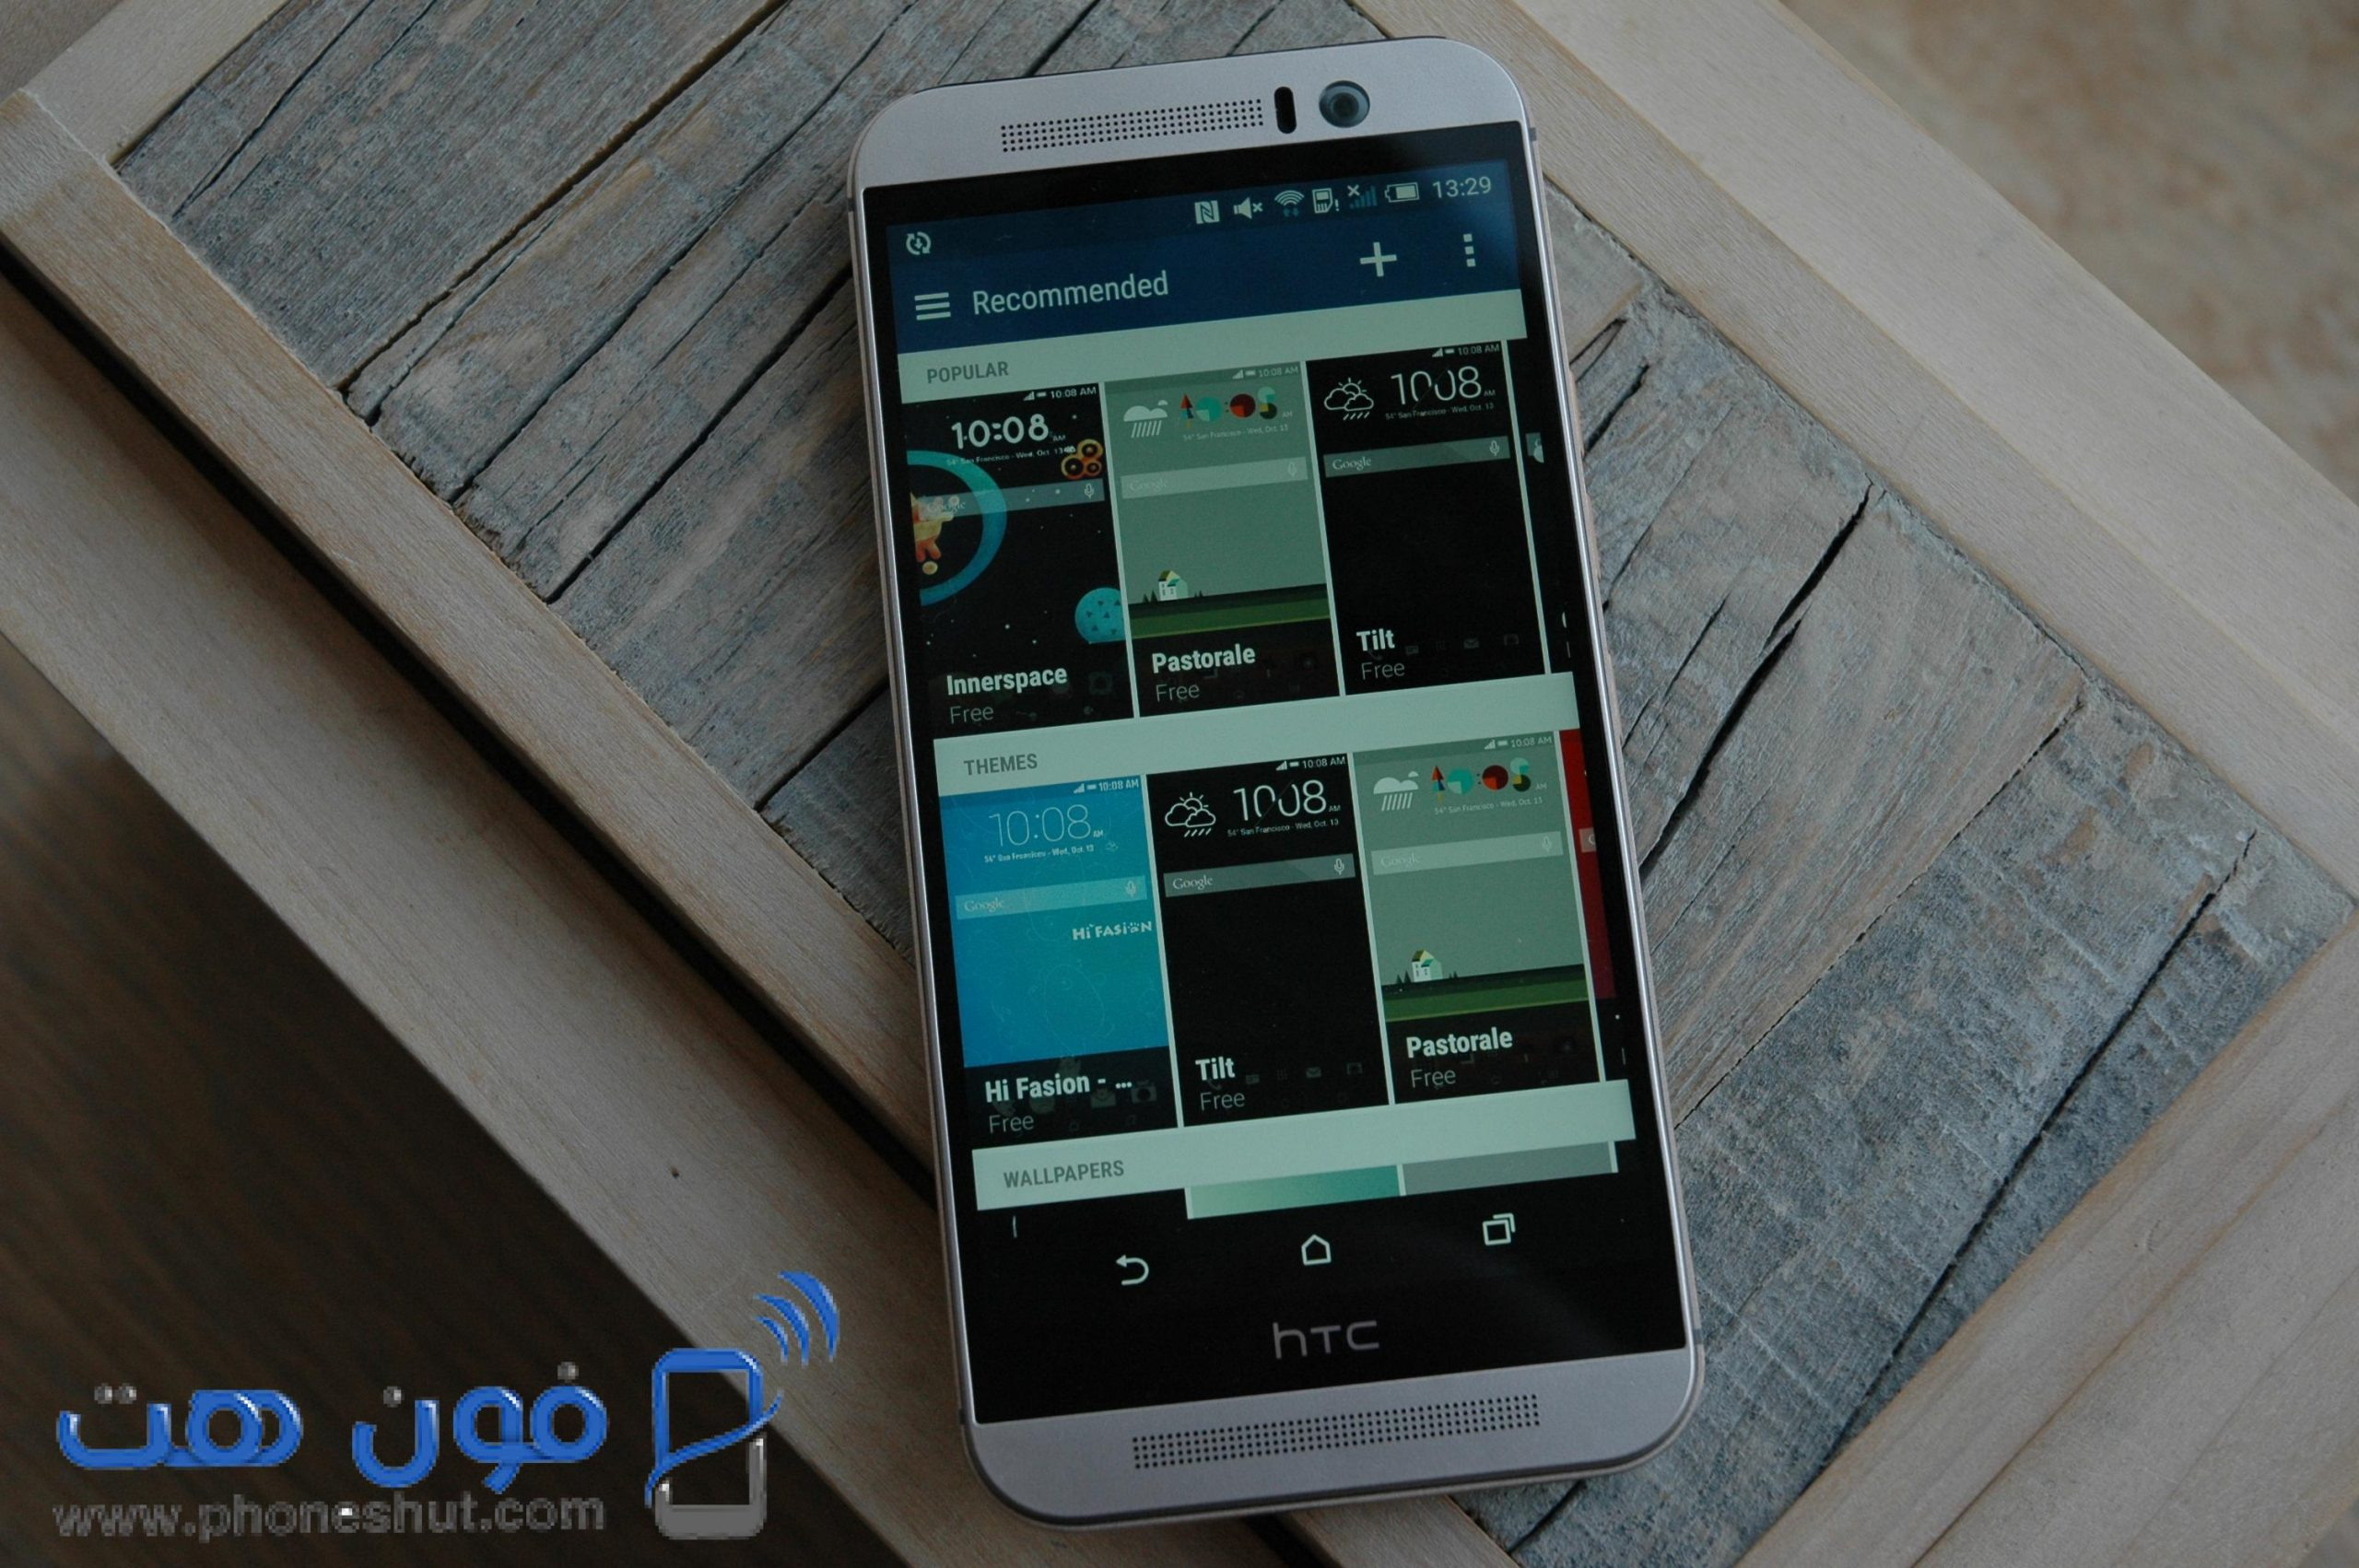 فيديو مراجعة موبايل HTC One M9